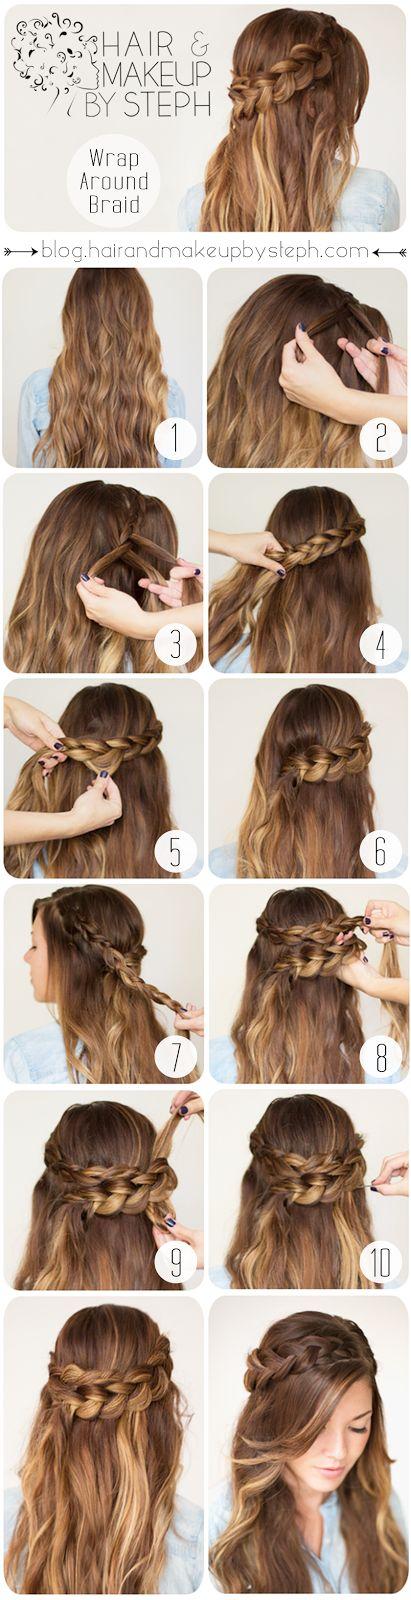 Excellent Hairstyle Ideas Hairstyles And Braids On Pinterest Short Hairstyles Gunalazisus